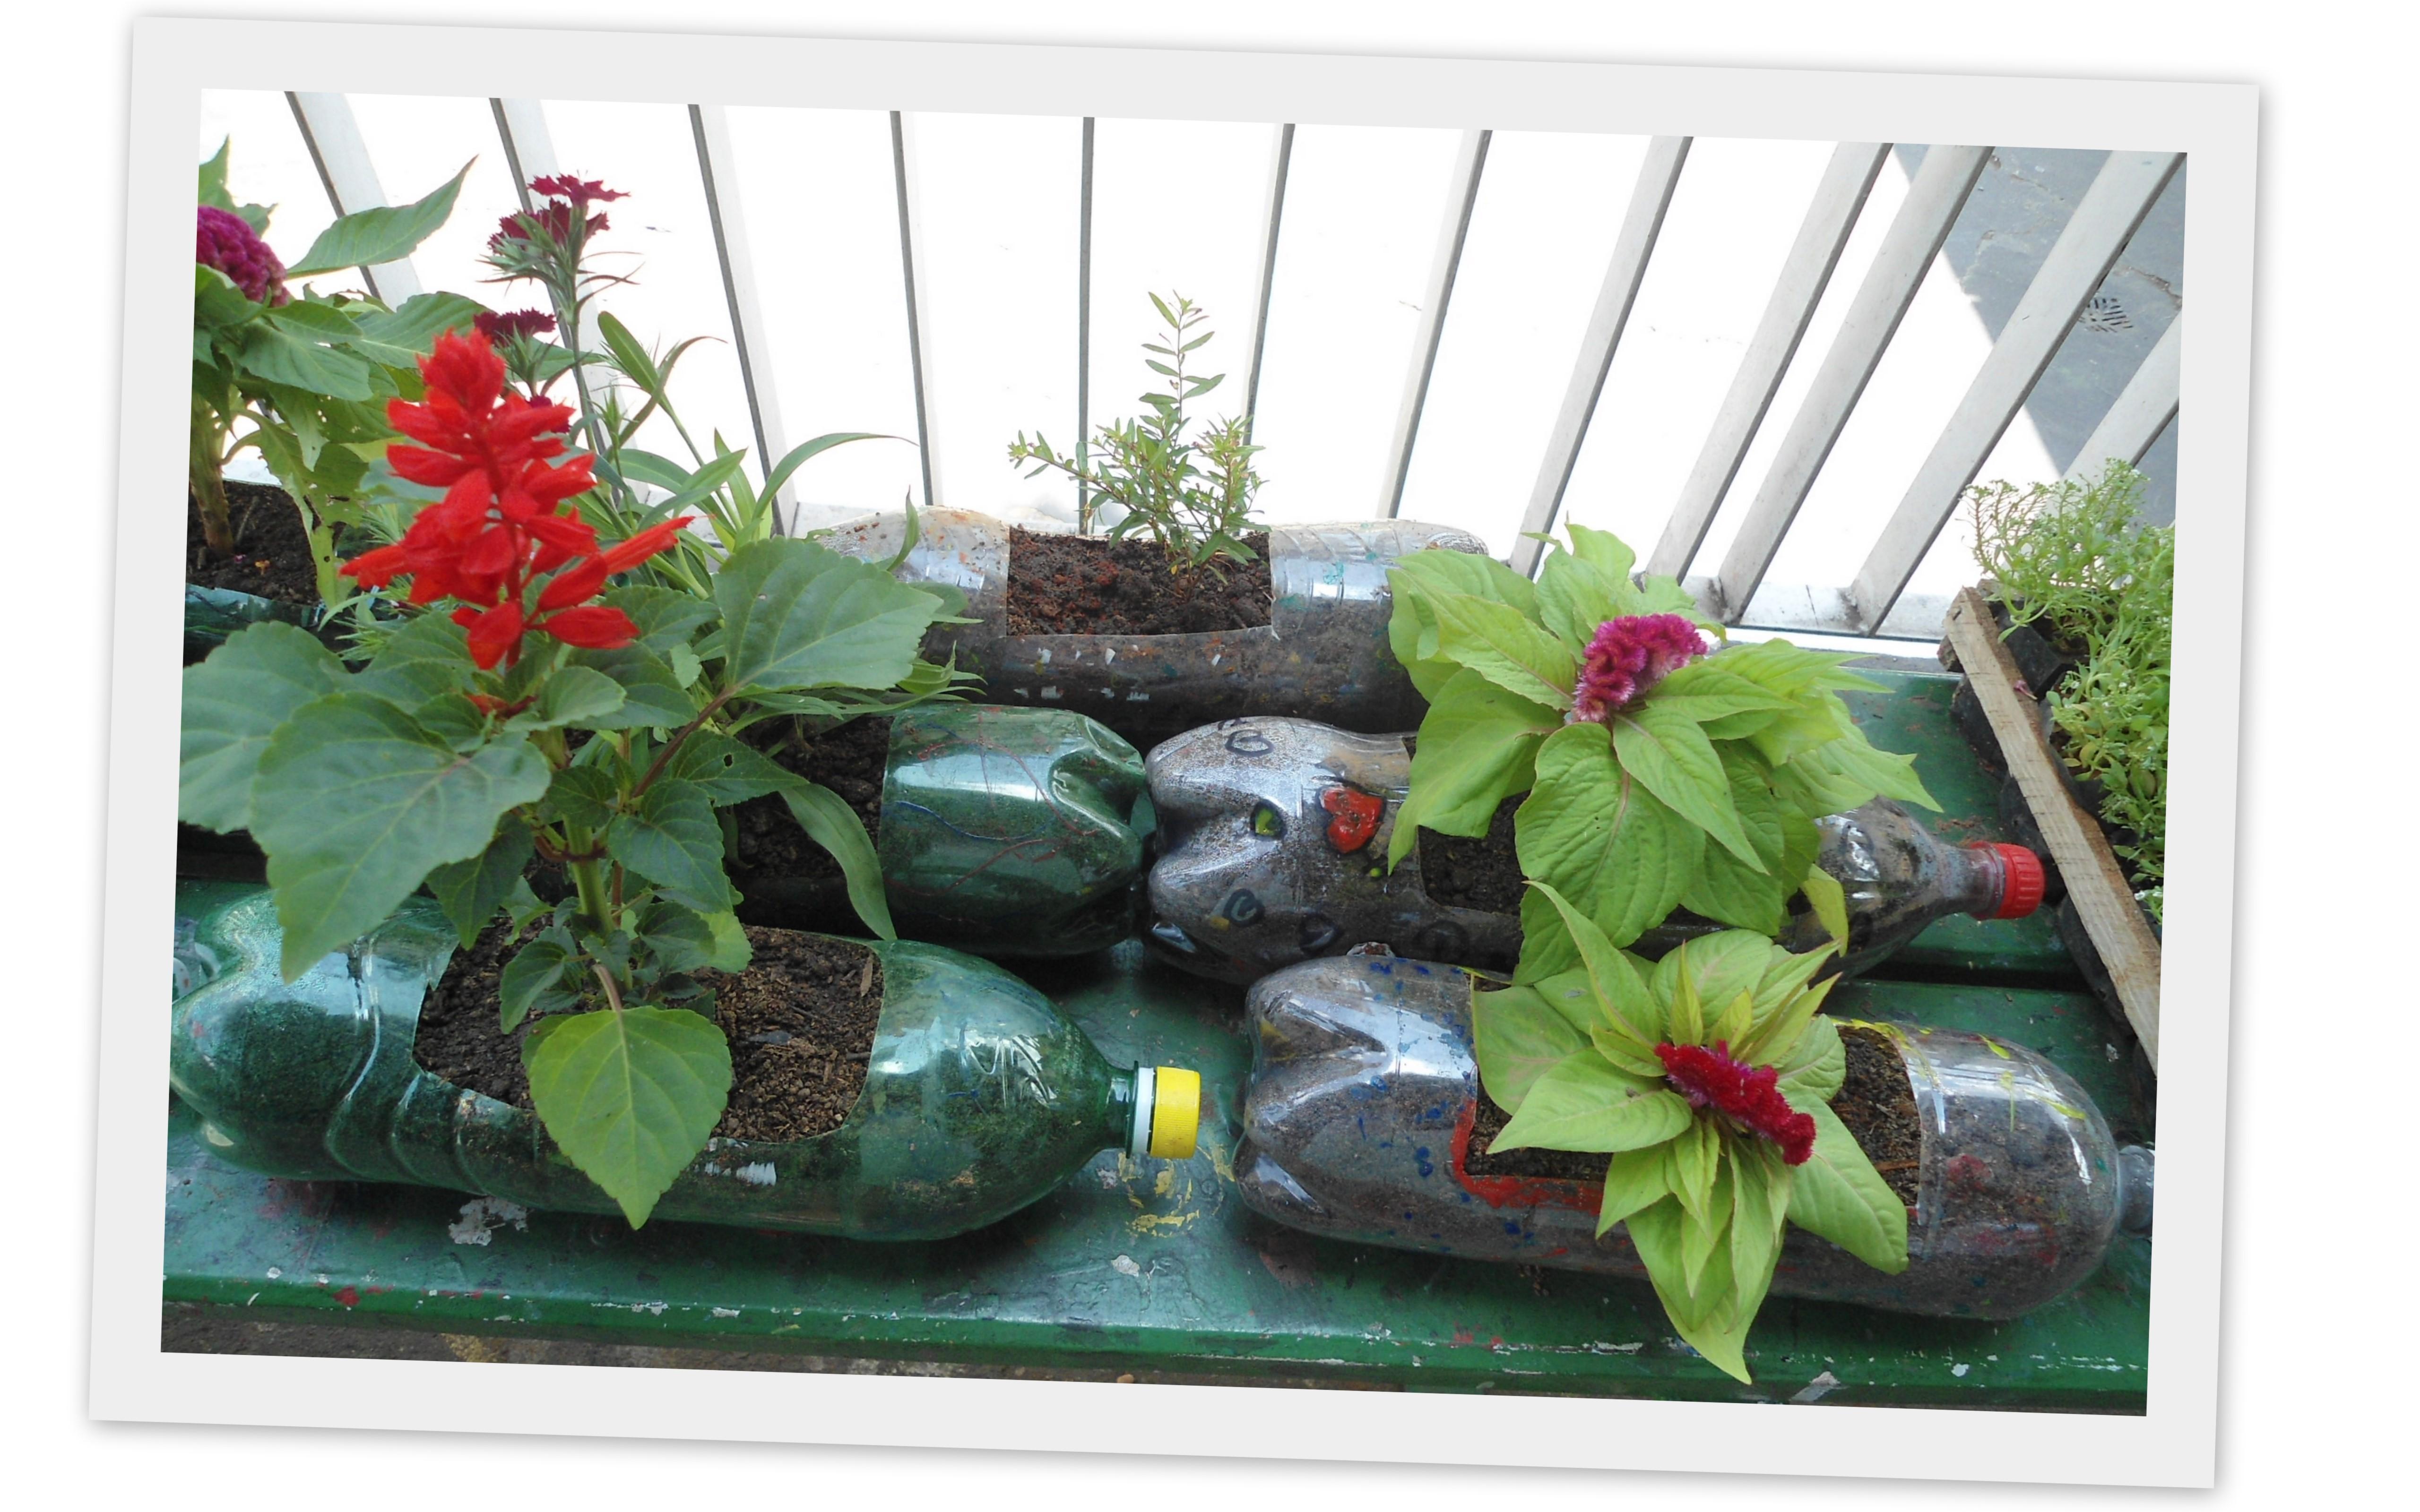 fazer jardim vertical garrafa pet:Jardim Suspenso Com Garrafas Pet